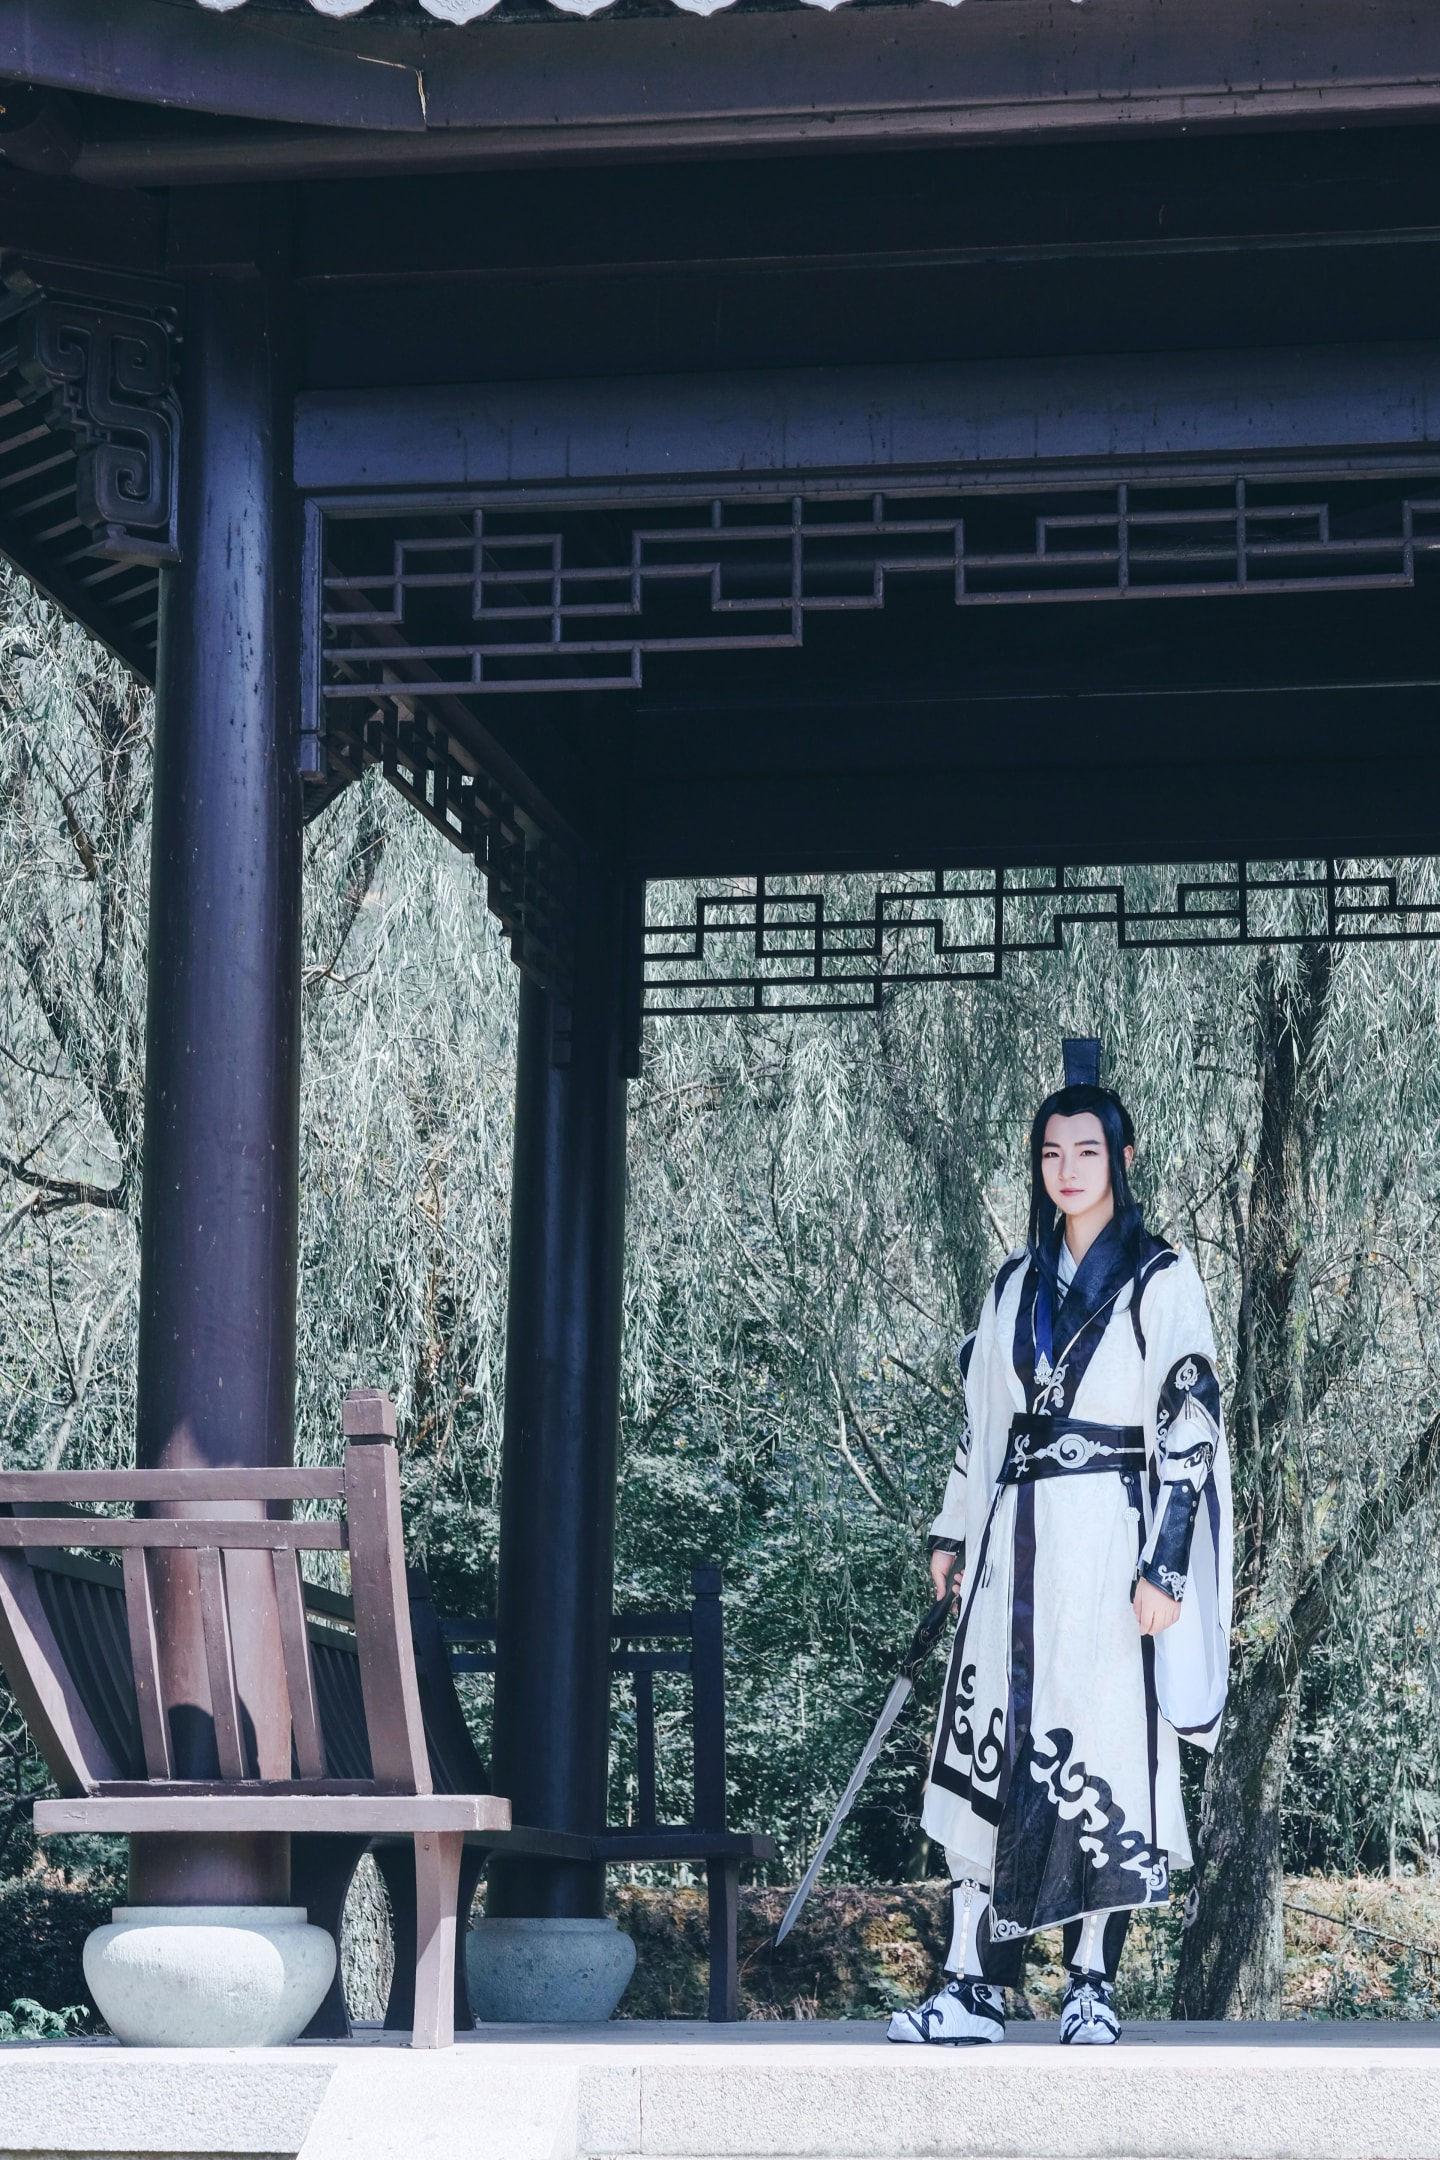 剑网三纯阳cosplay插图